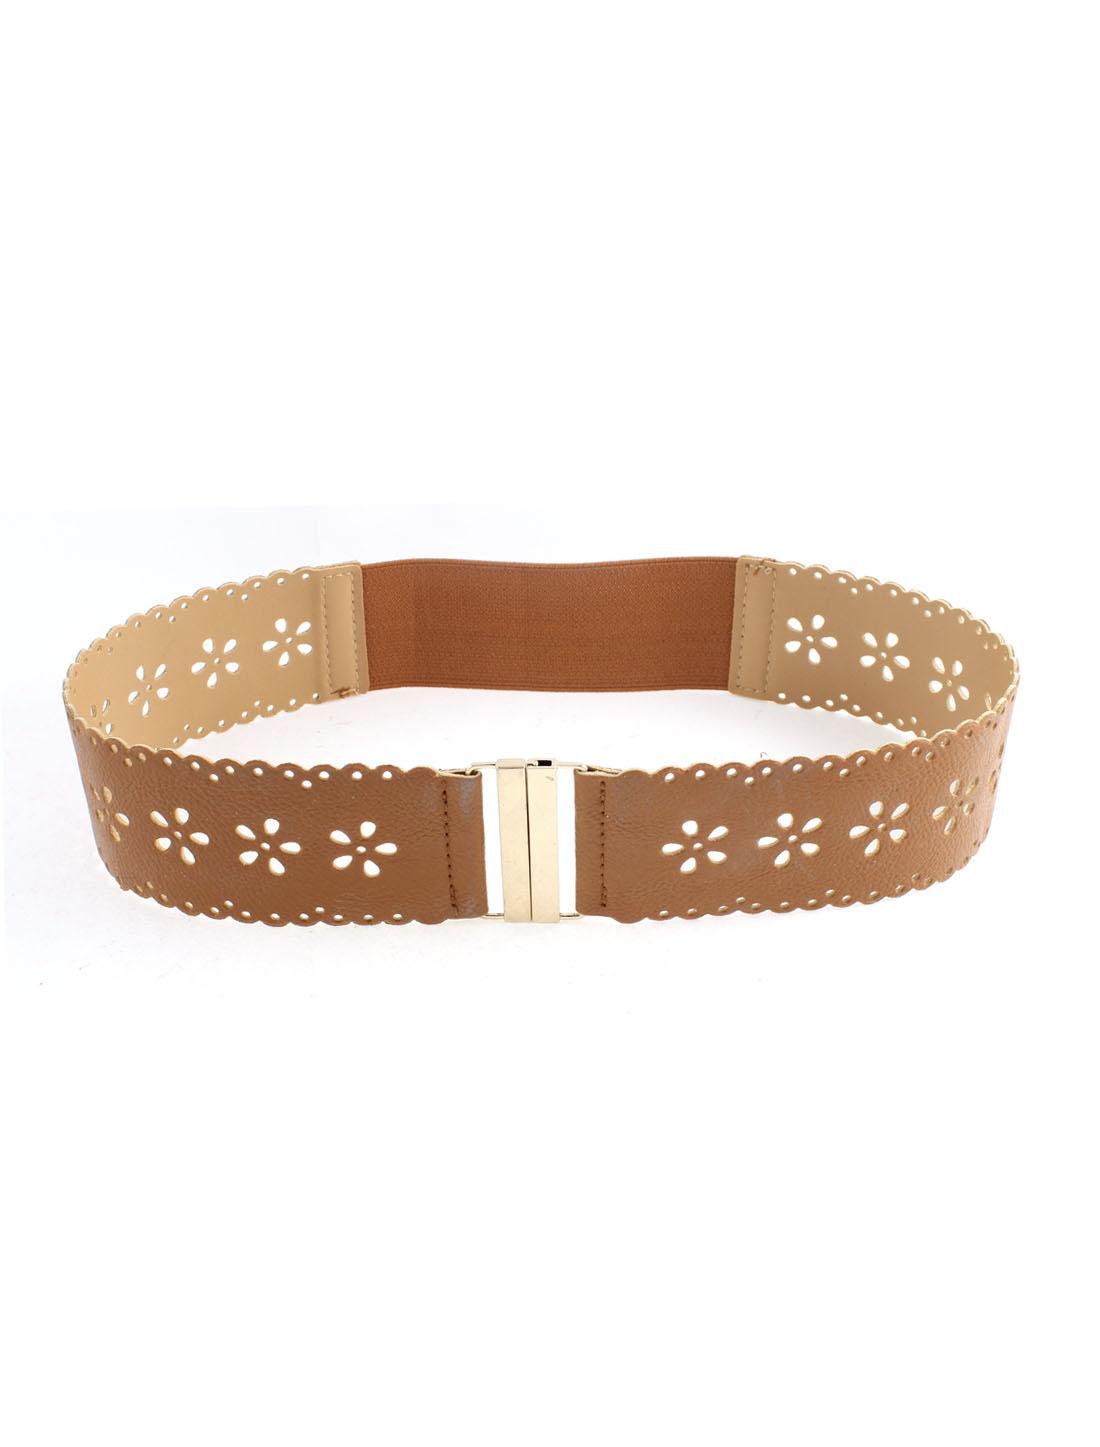 Ladies Slide Buckle Flower Hollow Out Wide Band Elastic Waist Belt Brown